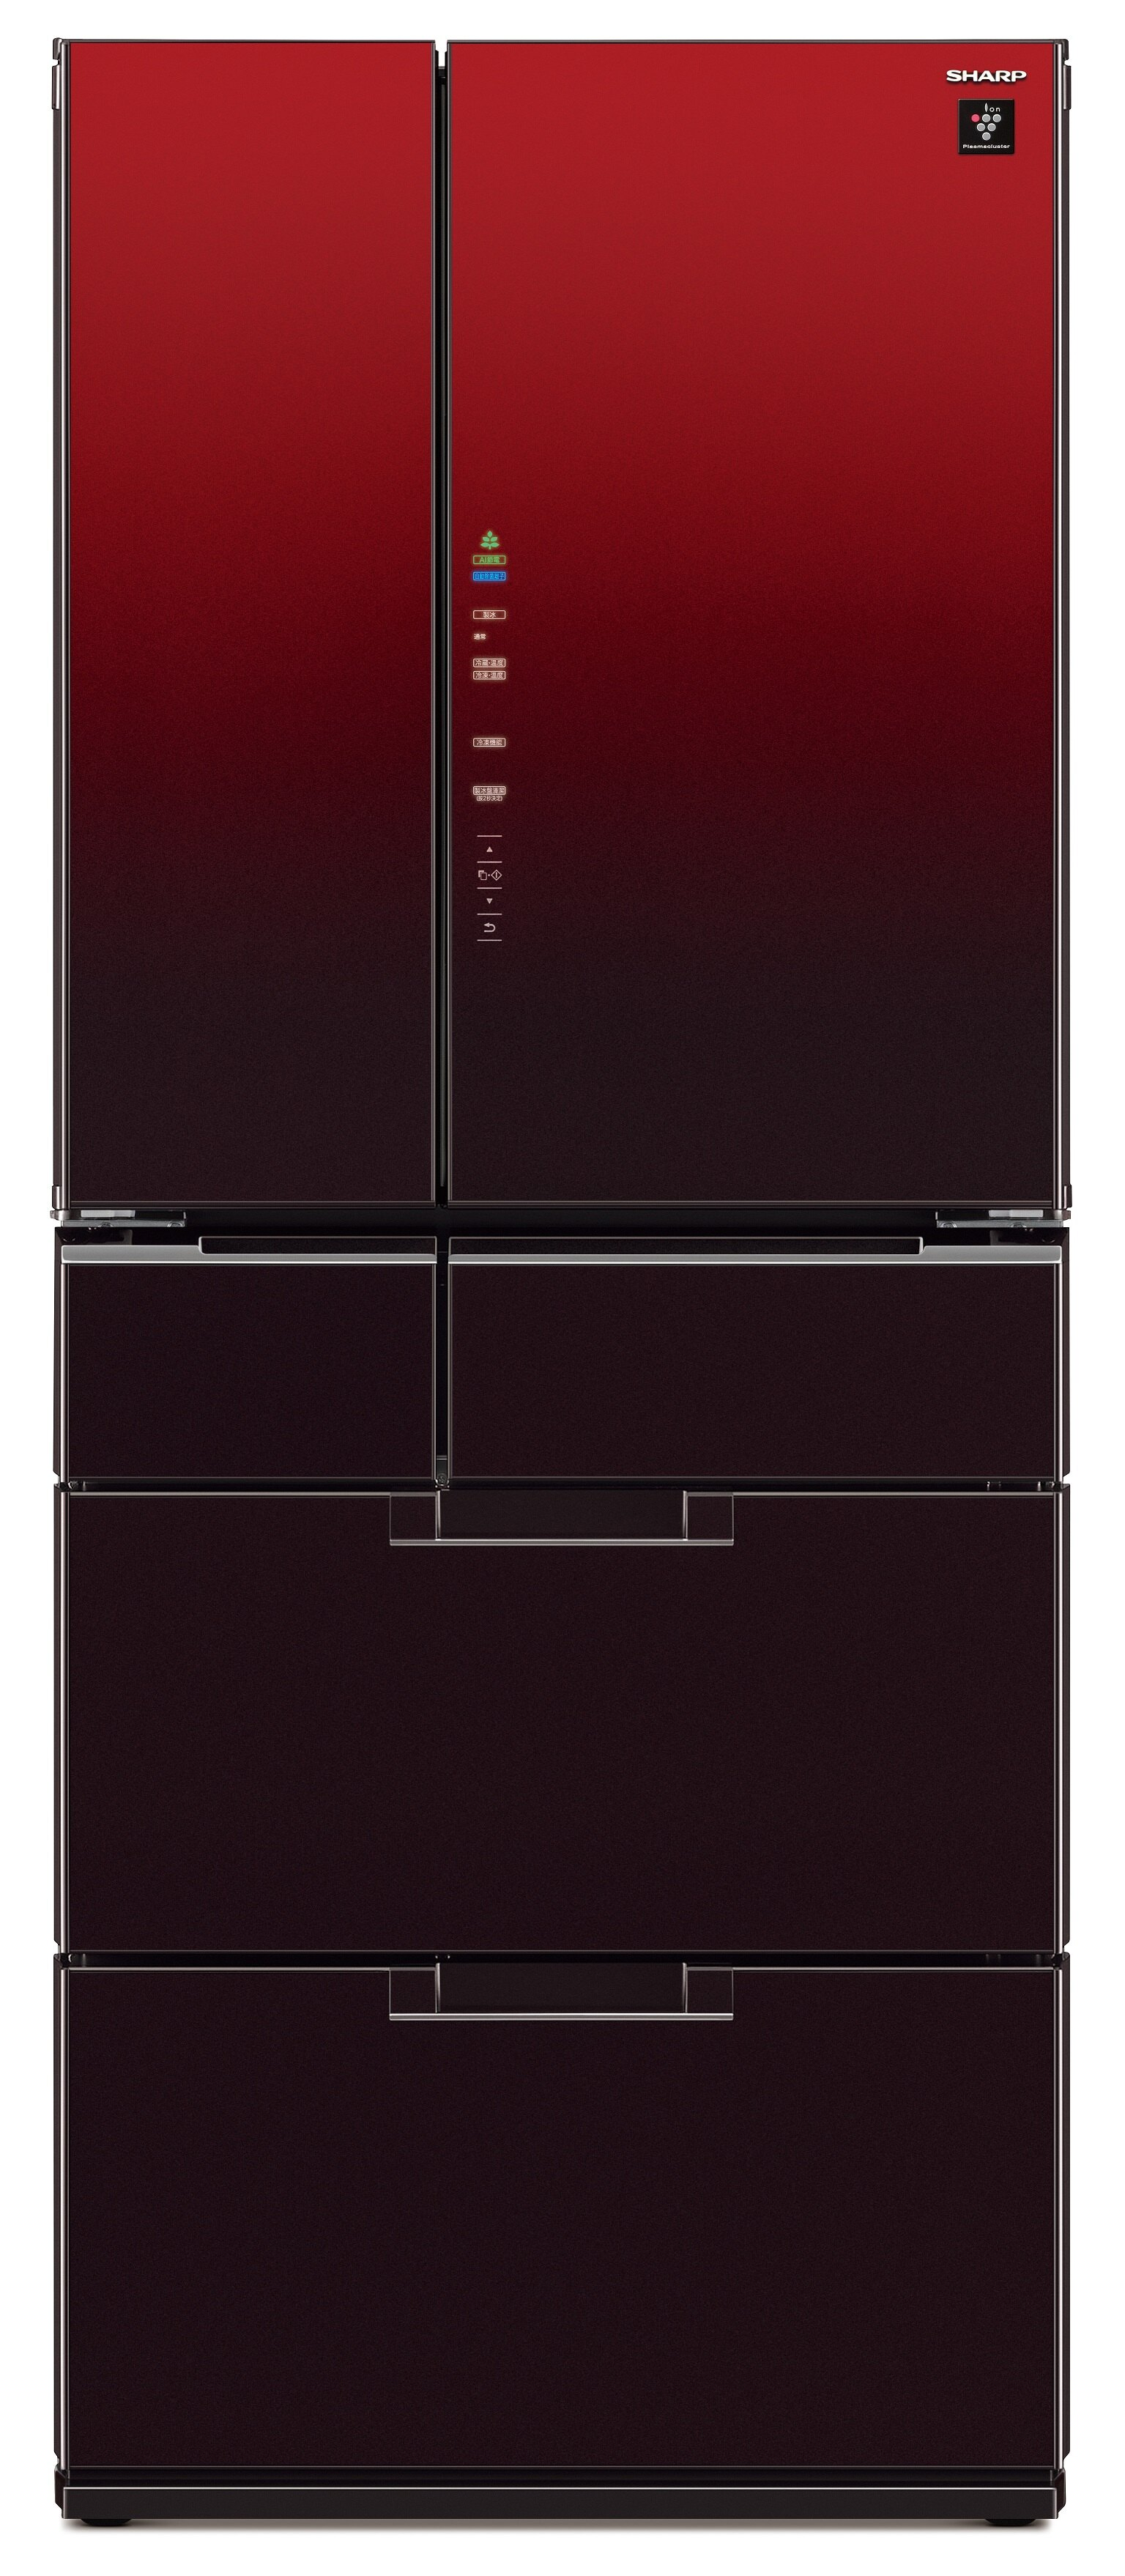 SHARP 夏普 SJ-GF60BT-R (星鑽紅) 變頻六門對開冰箱 (601L) ~日本製~【零利率】※熱線07-7428010